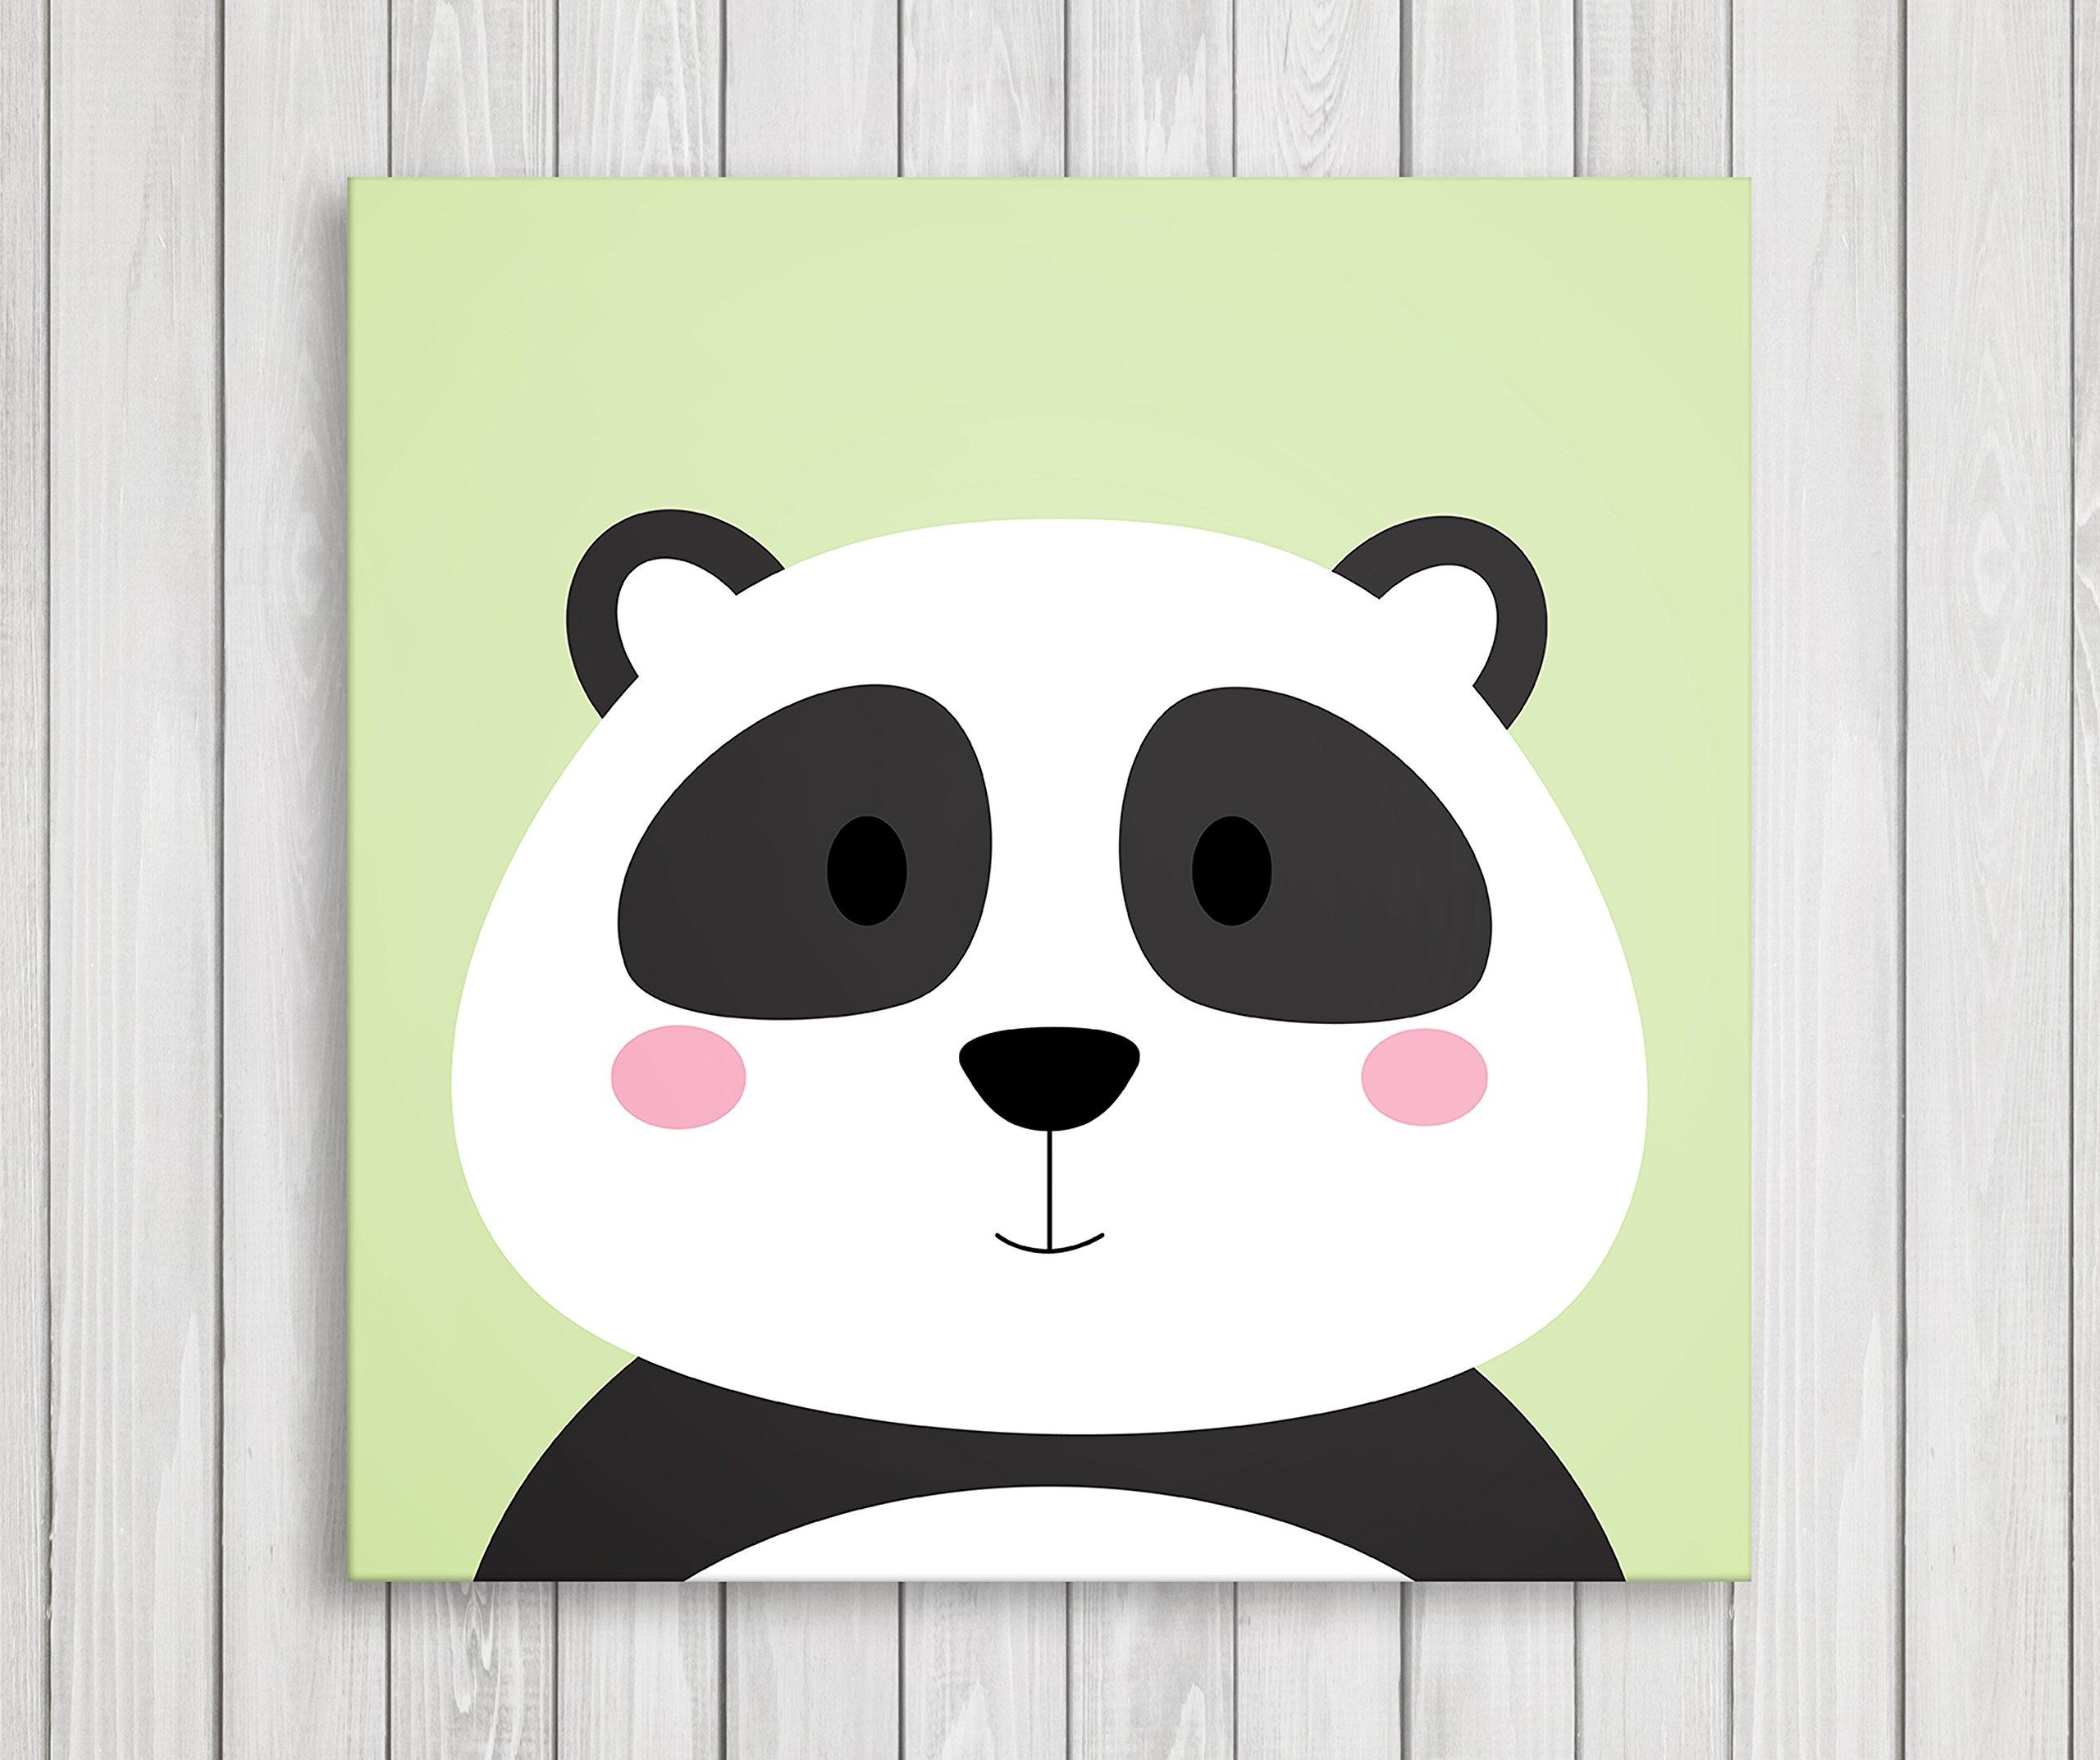 Cute Little Animals Nursery Wall Decor, Baby Room Canvas Art (11'' W x 11'' H, Panda)